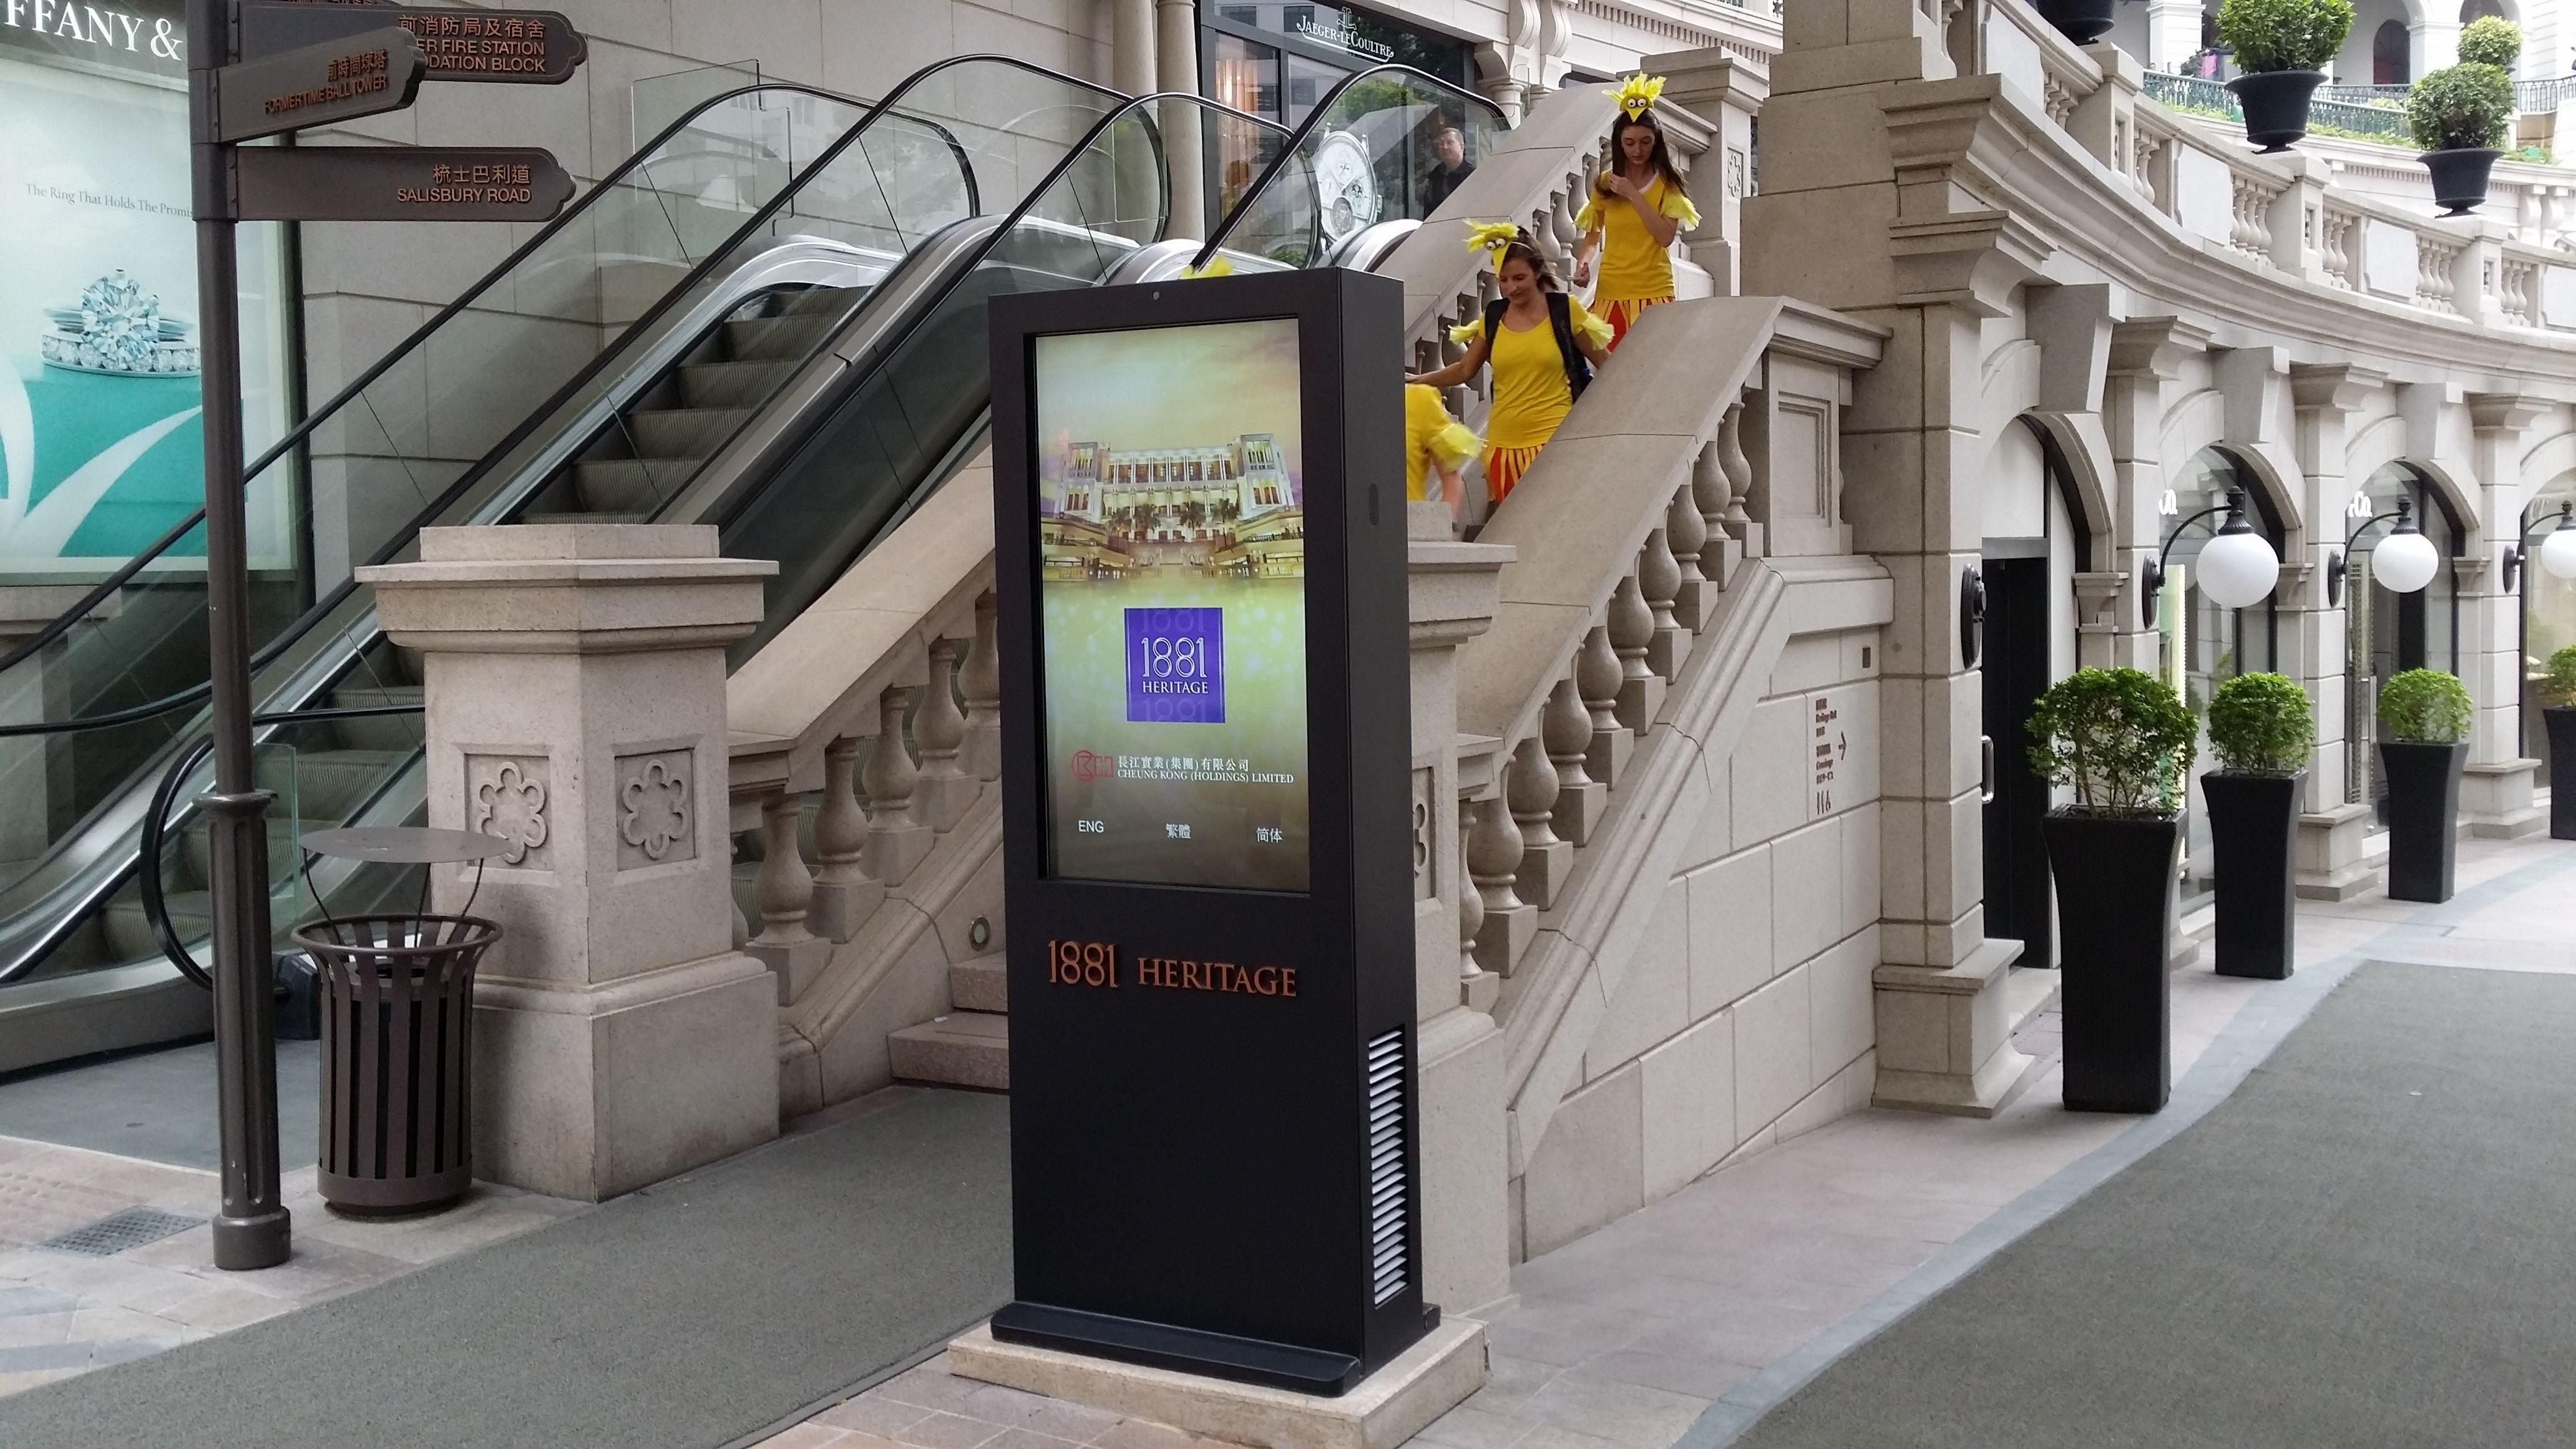 1881 heritage 户外立式广告机